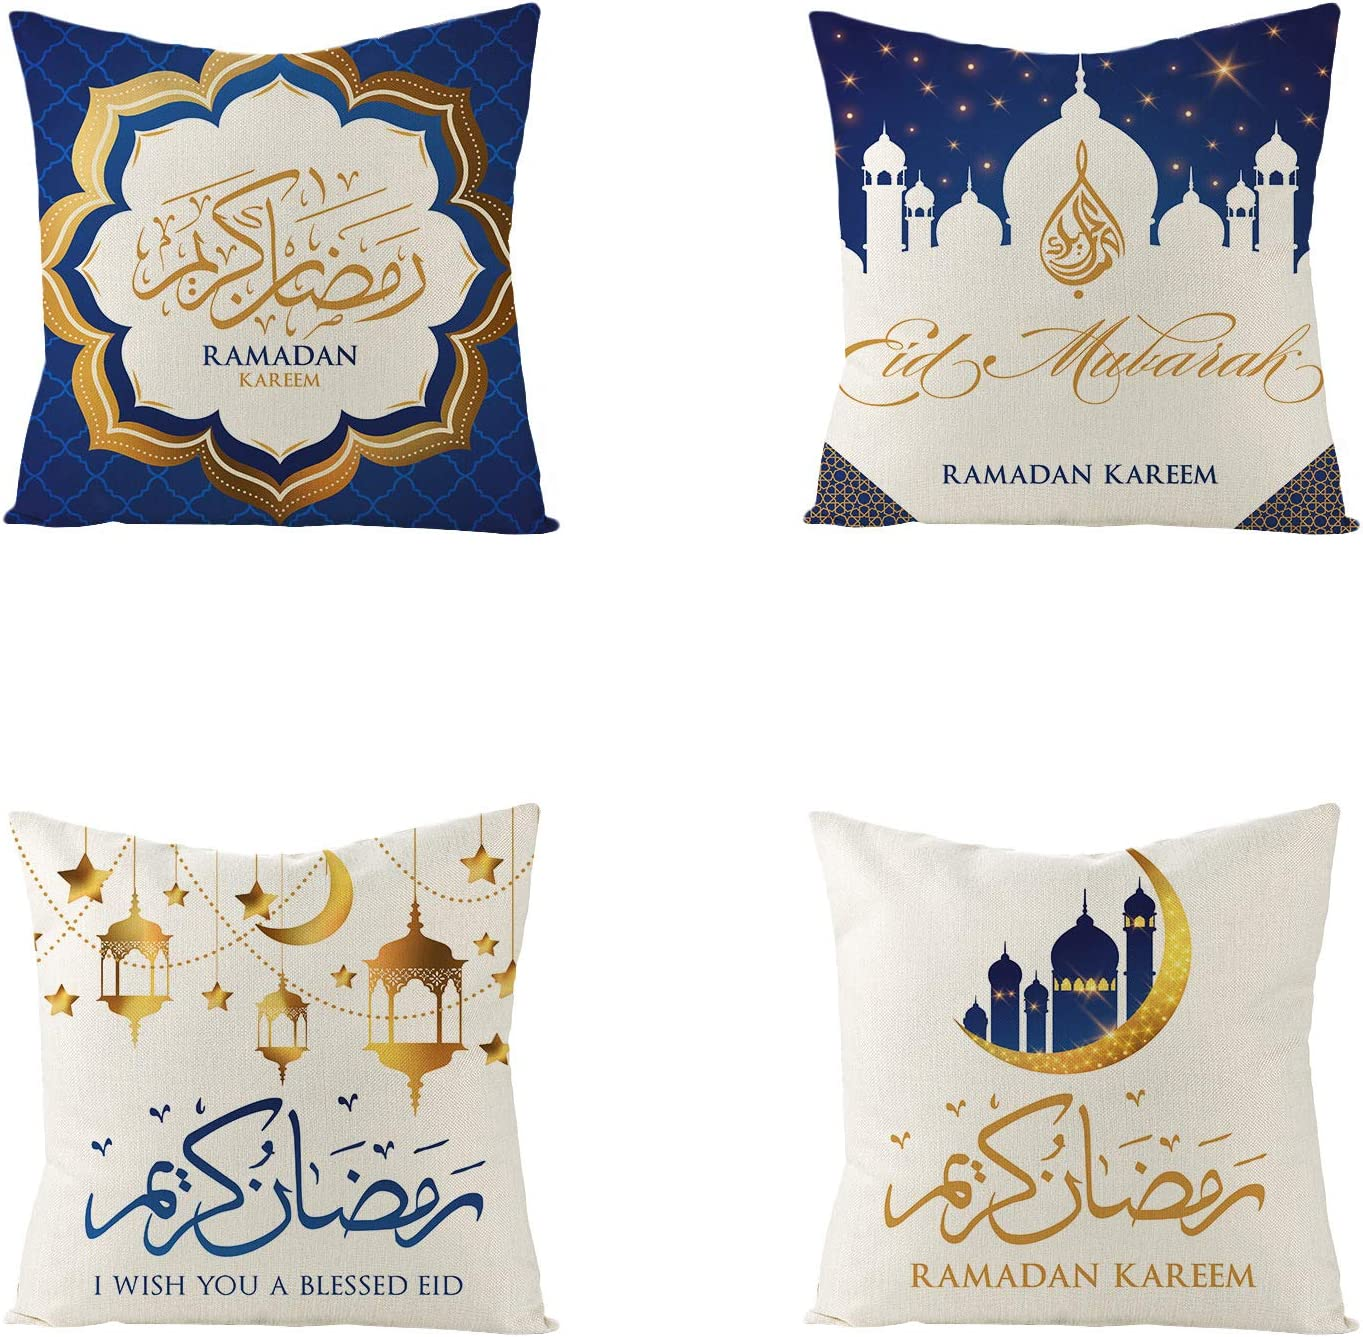 "4 Pieces Ramadan Kareem Pillow Cover IslamicSquare EidMubarakThrow Pillow Case Sofa Bed Couch Throw Cushion Cover Decoration (18"" x 18"")"